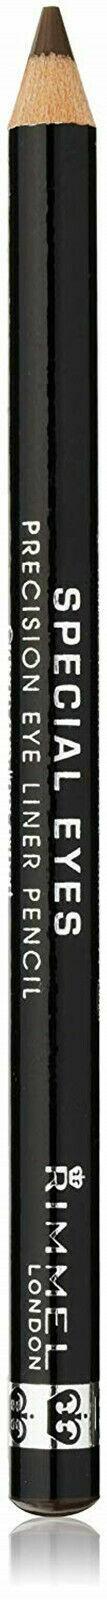 Rimmel Special Eyes Eyeliner Pencil - 111 Panama Brown